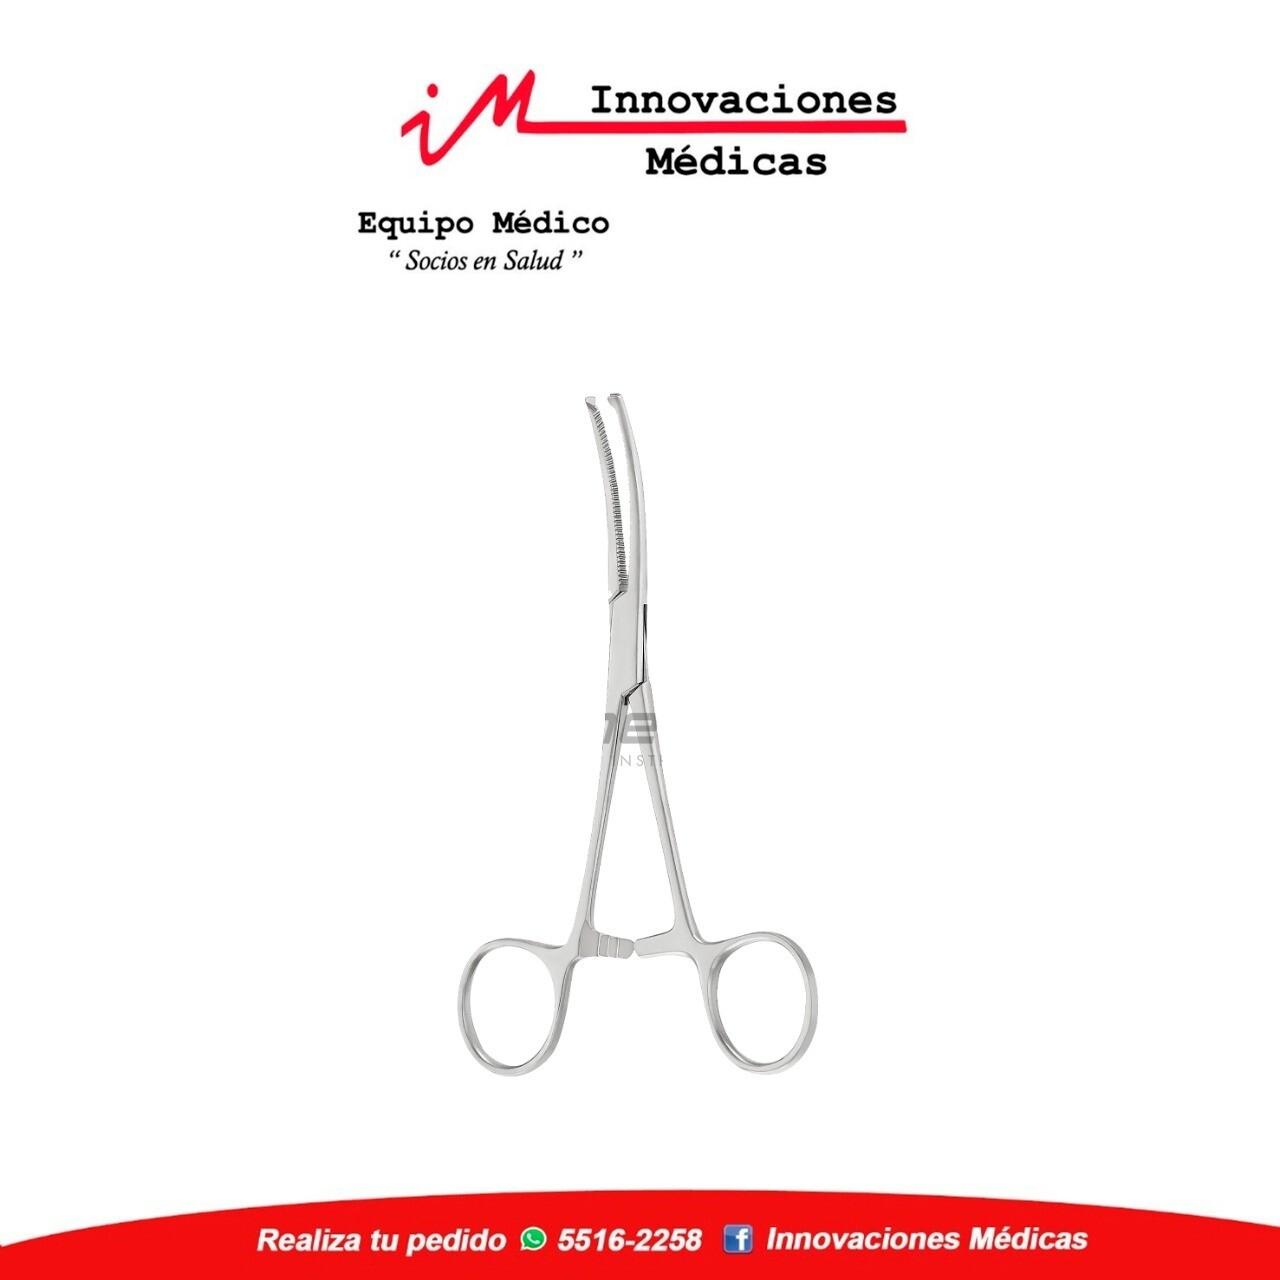 Pinza ROCHESTER-OCHSNER hemostatica  curva, 1x2 dientes